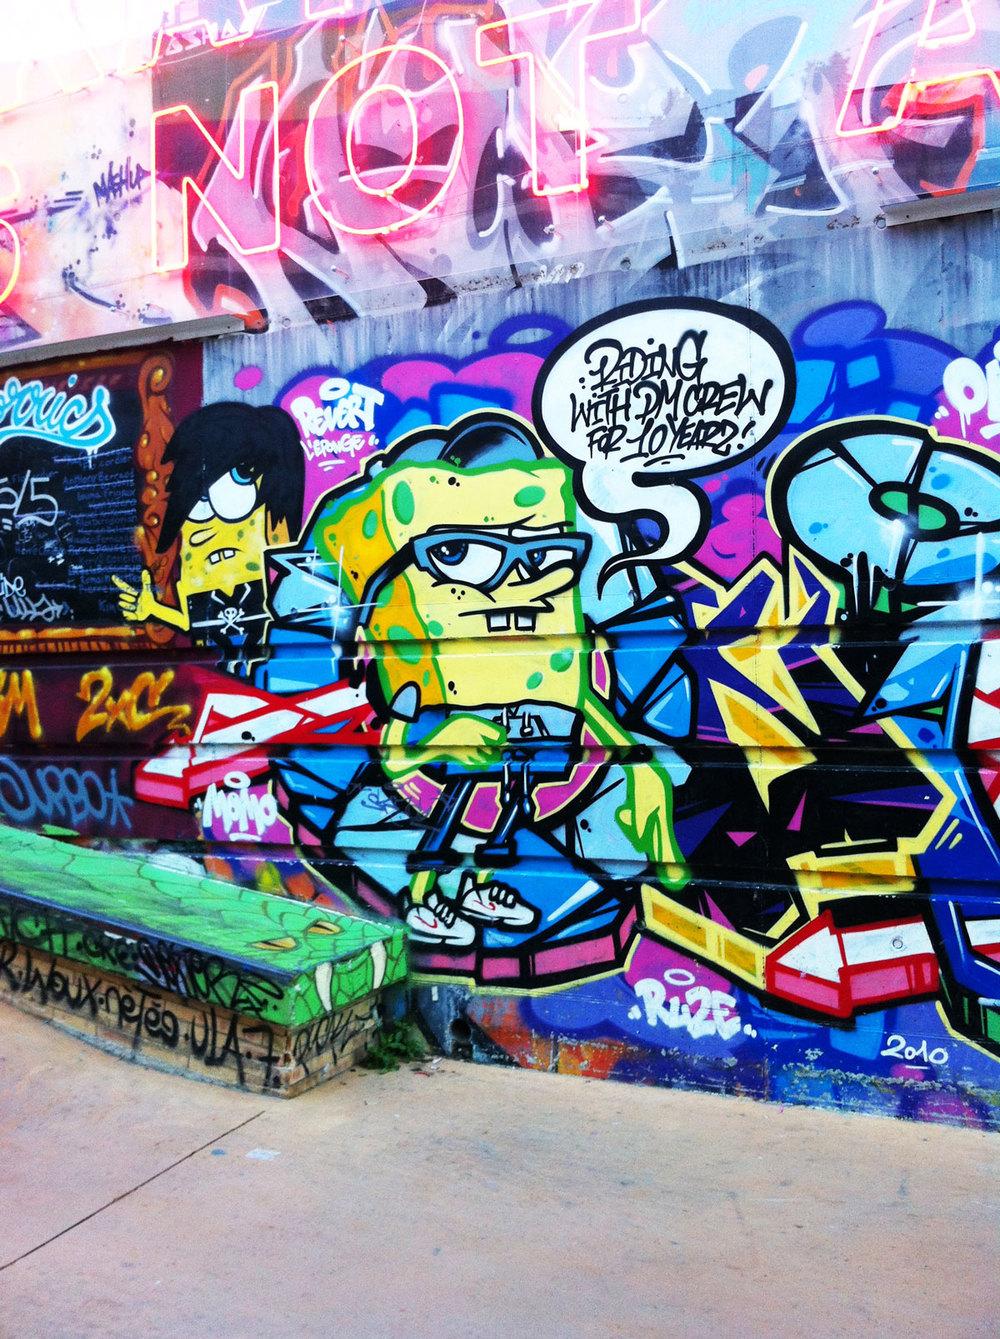 Streetart @ La friche